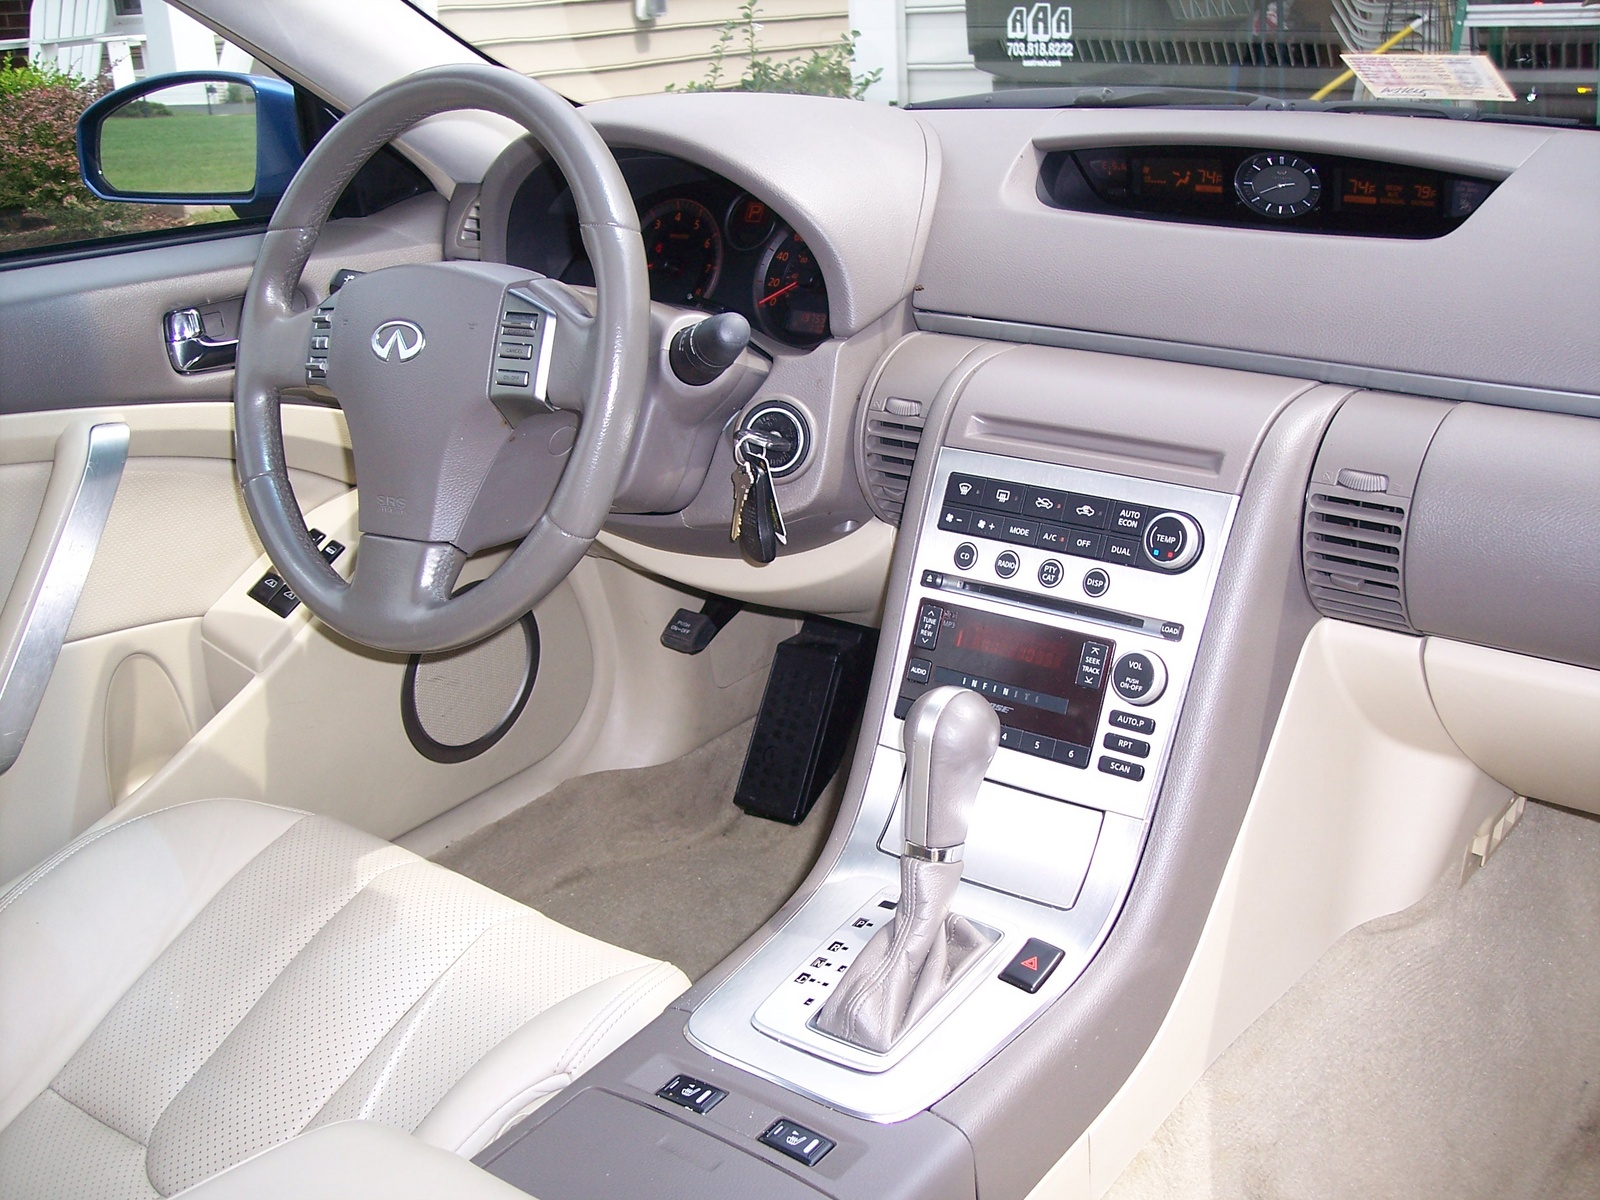 100 reviews 2005 g35 coupe interior on margojoyo hottrendstoday84977 infiniti g35 4 door images vanachro Image collections